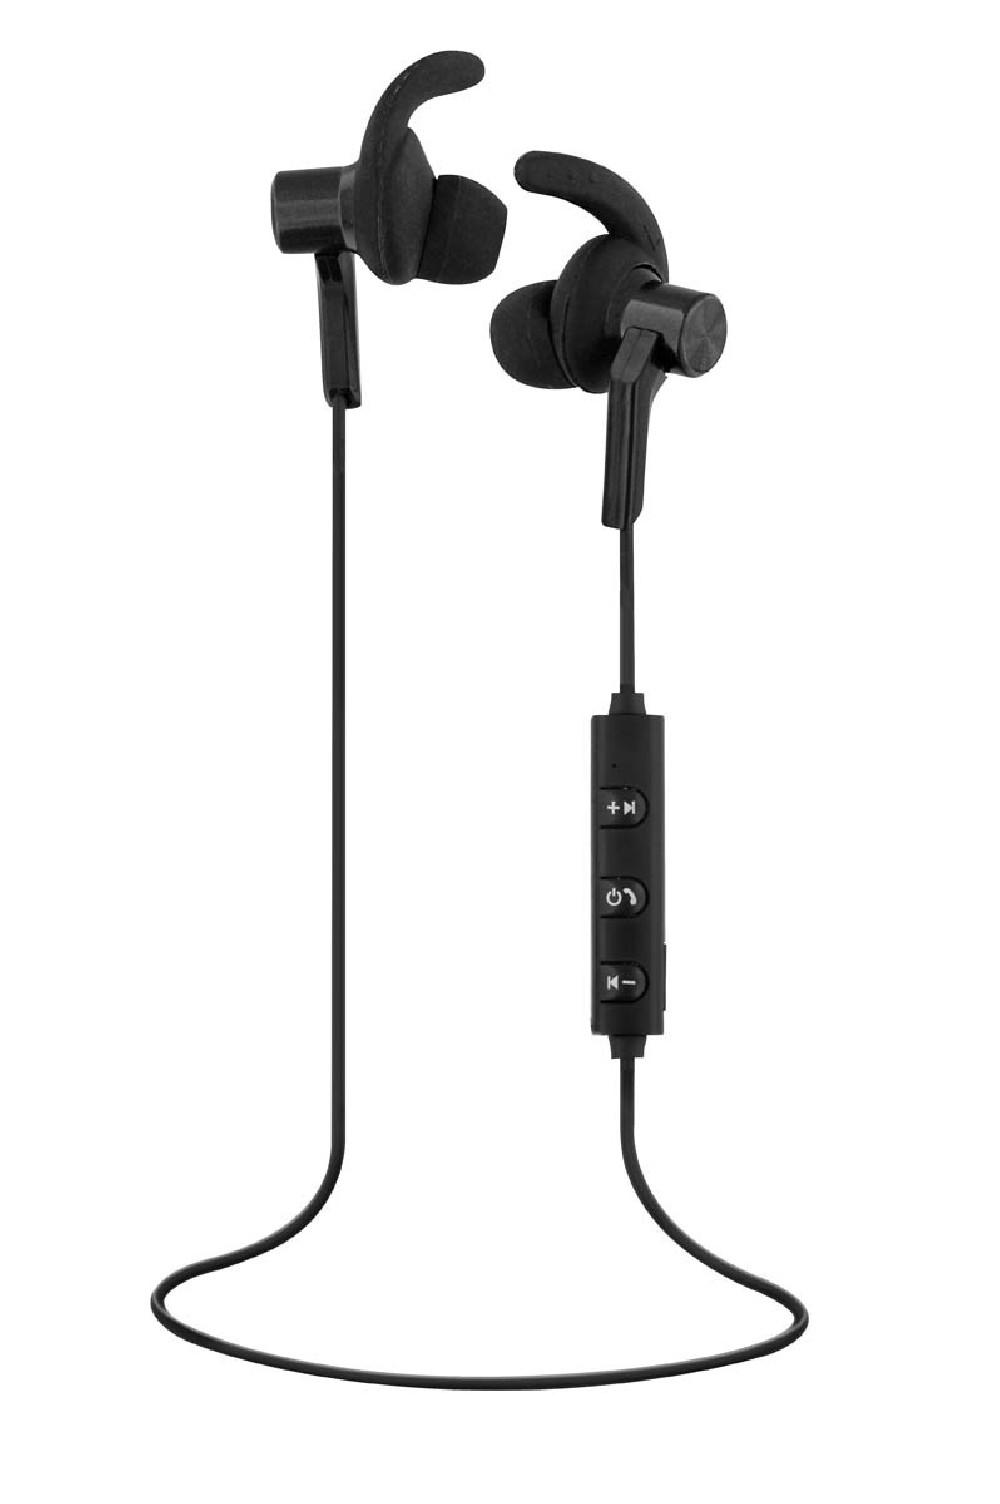 SPORT BLUETOOTH EARPHONES - BLACK